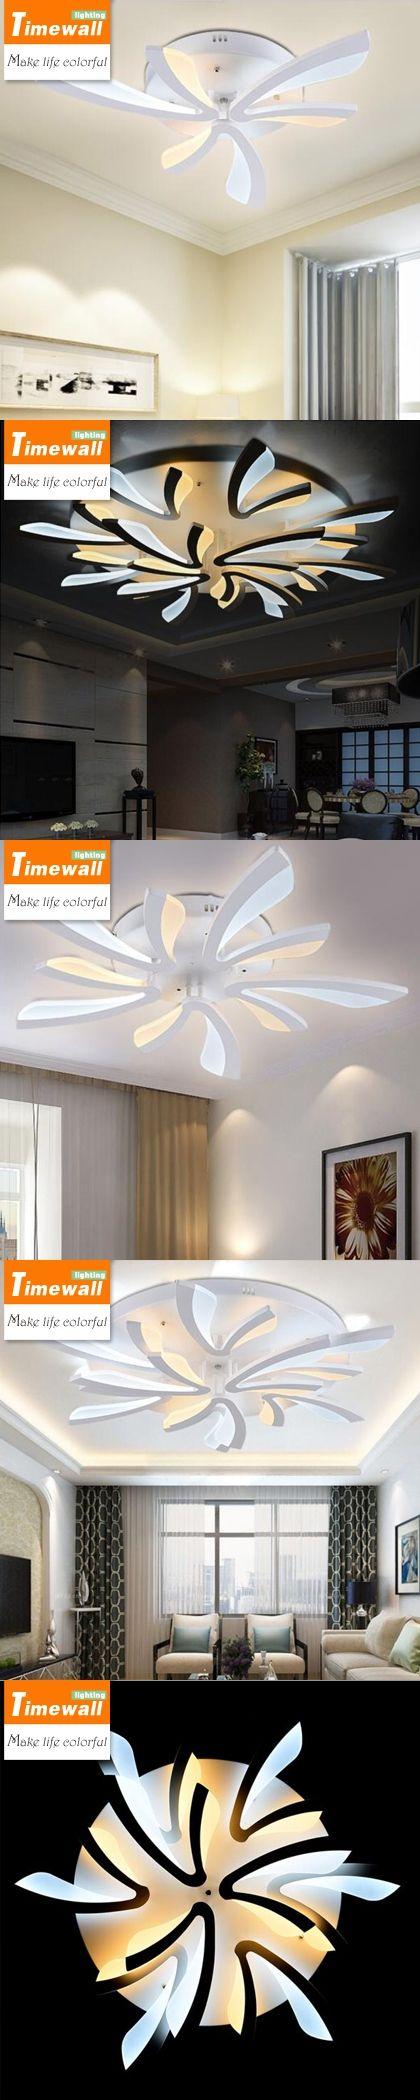 Dandelion led living room ceiling lighting modern minimalist bedroom ...